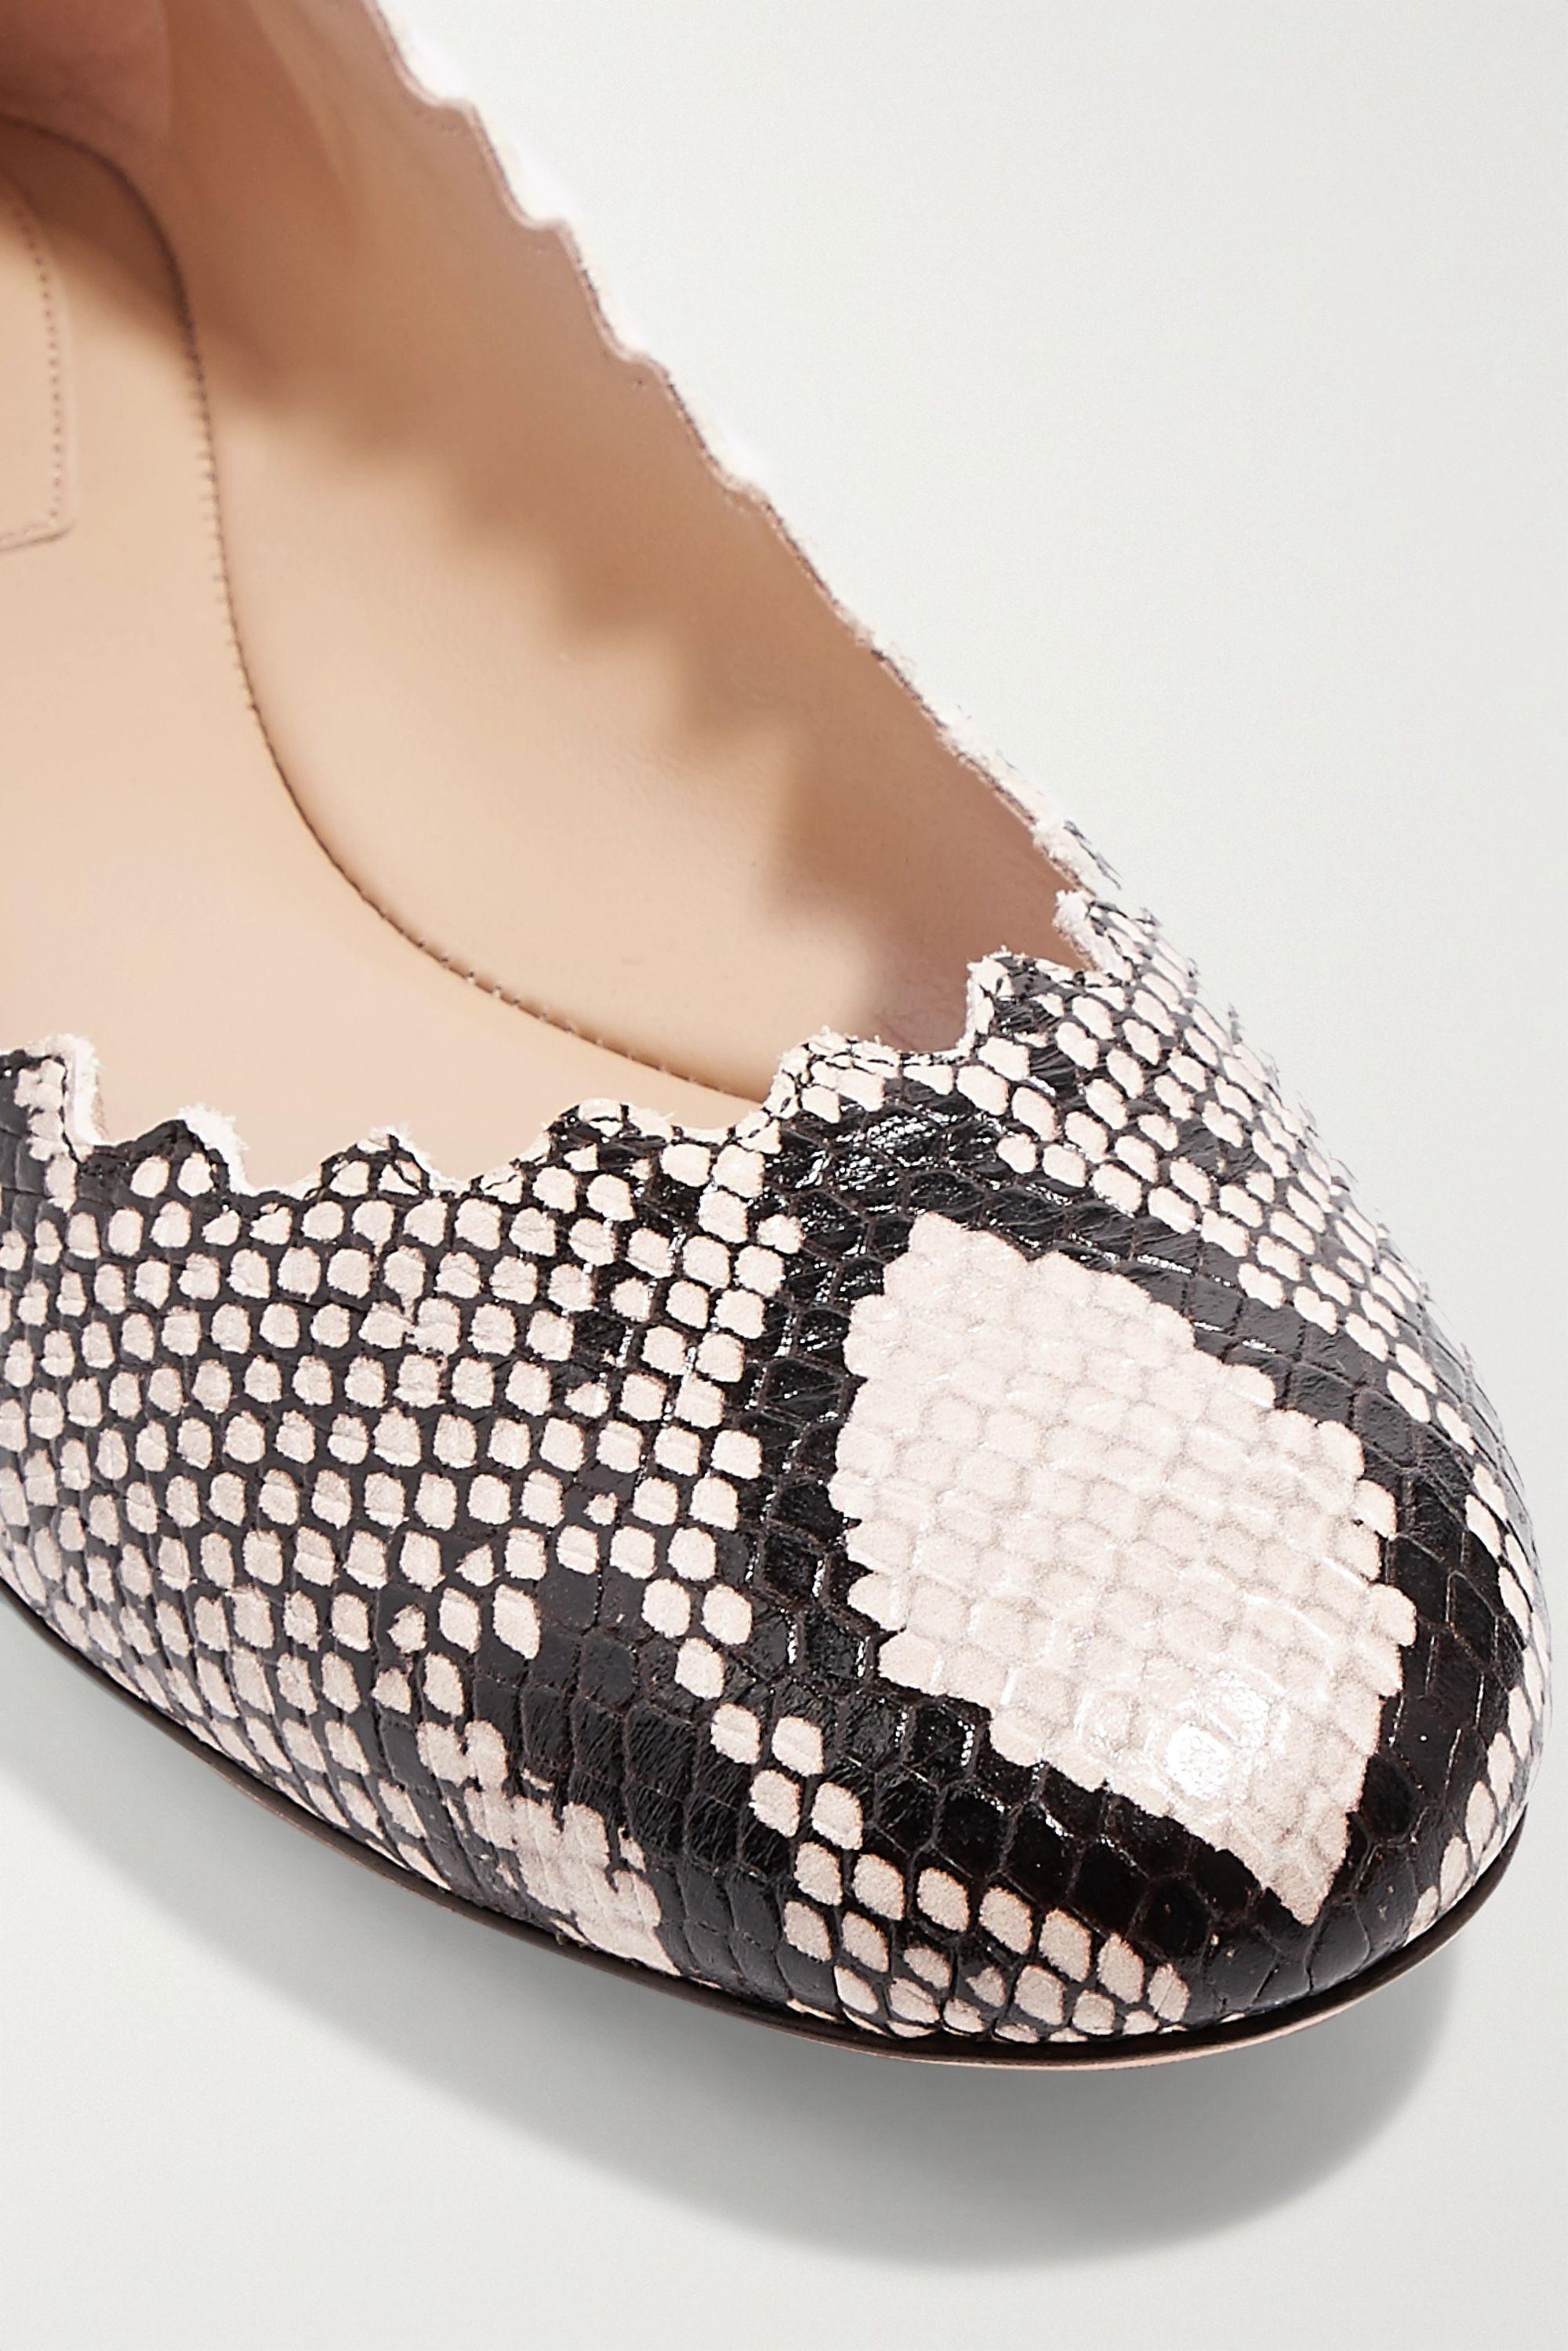 Chloé Lauren scalloped snake-effect leather ballet flats